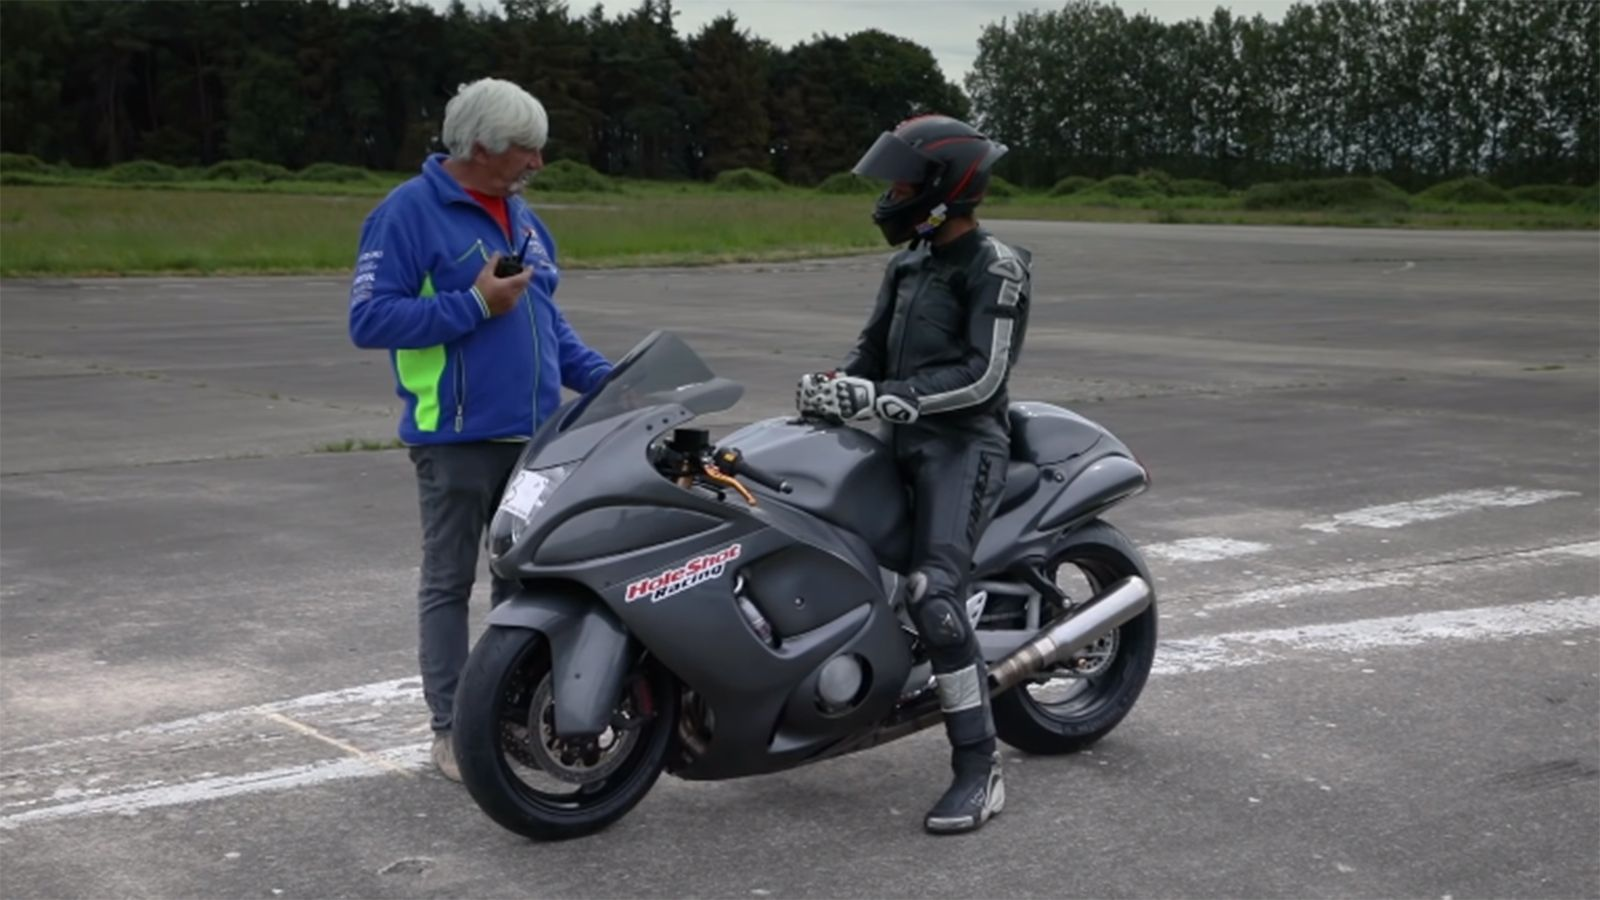 Guy Martin: Αγγιξε τα 436 χιλιόμετρα την ώρα! Martin_speed_1992019